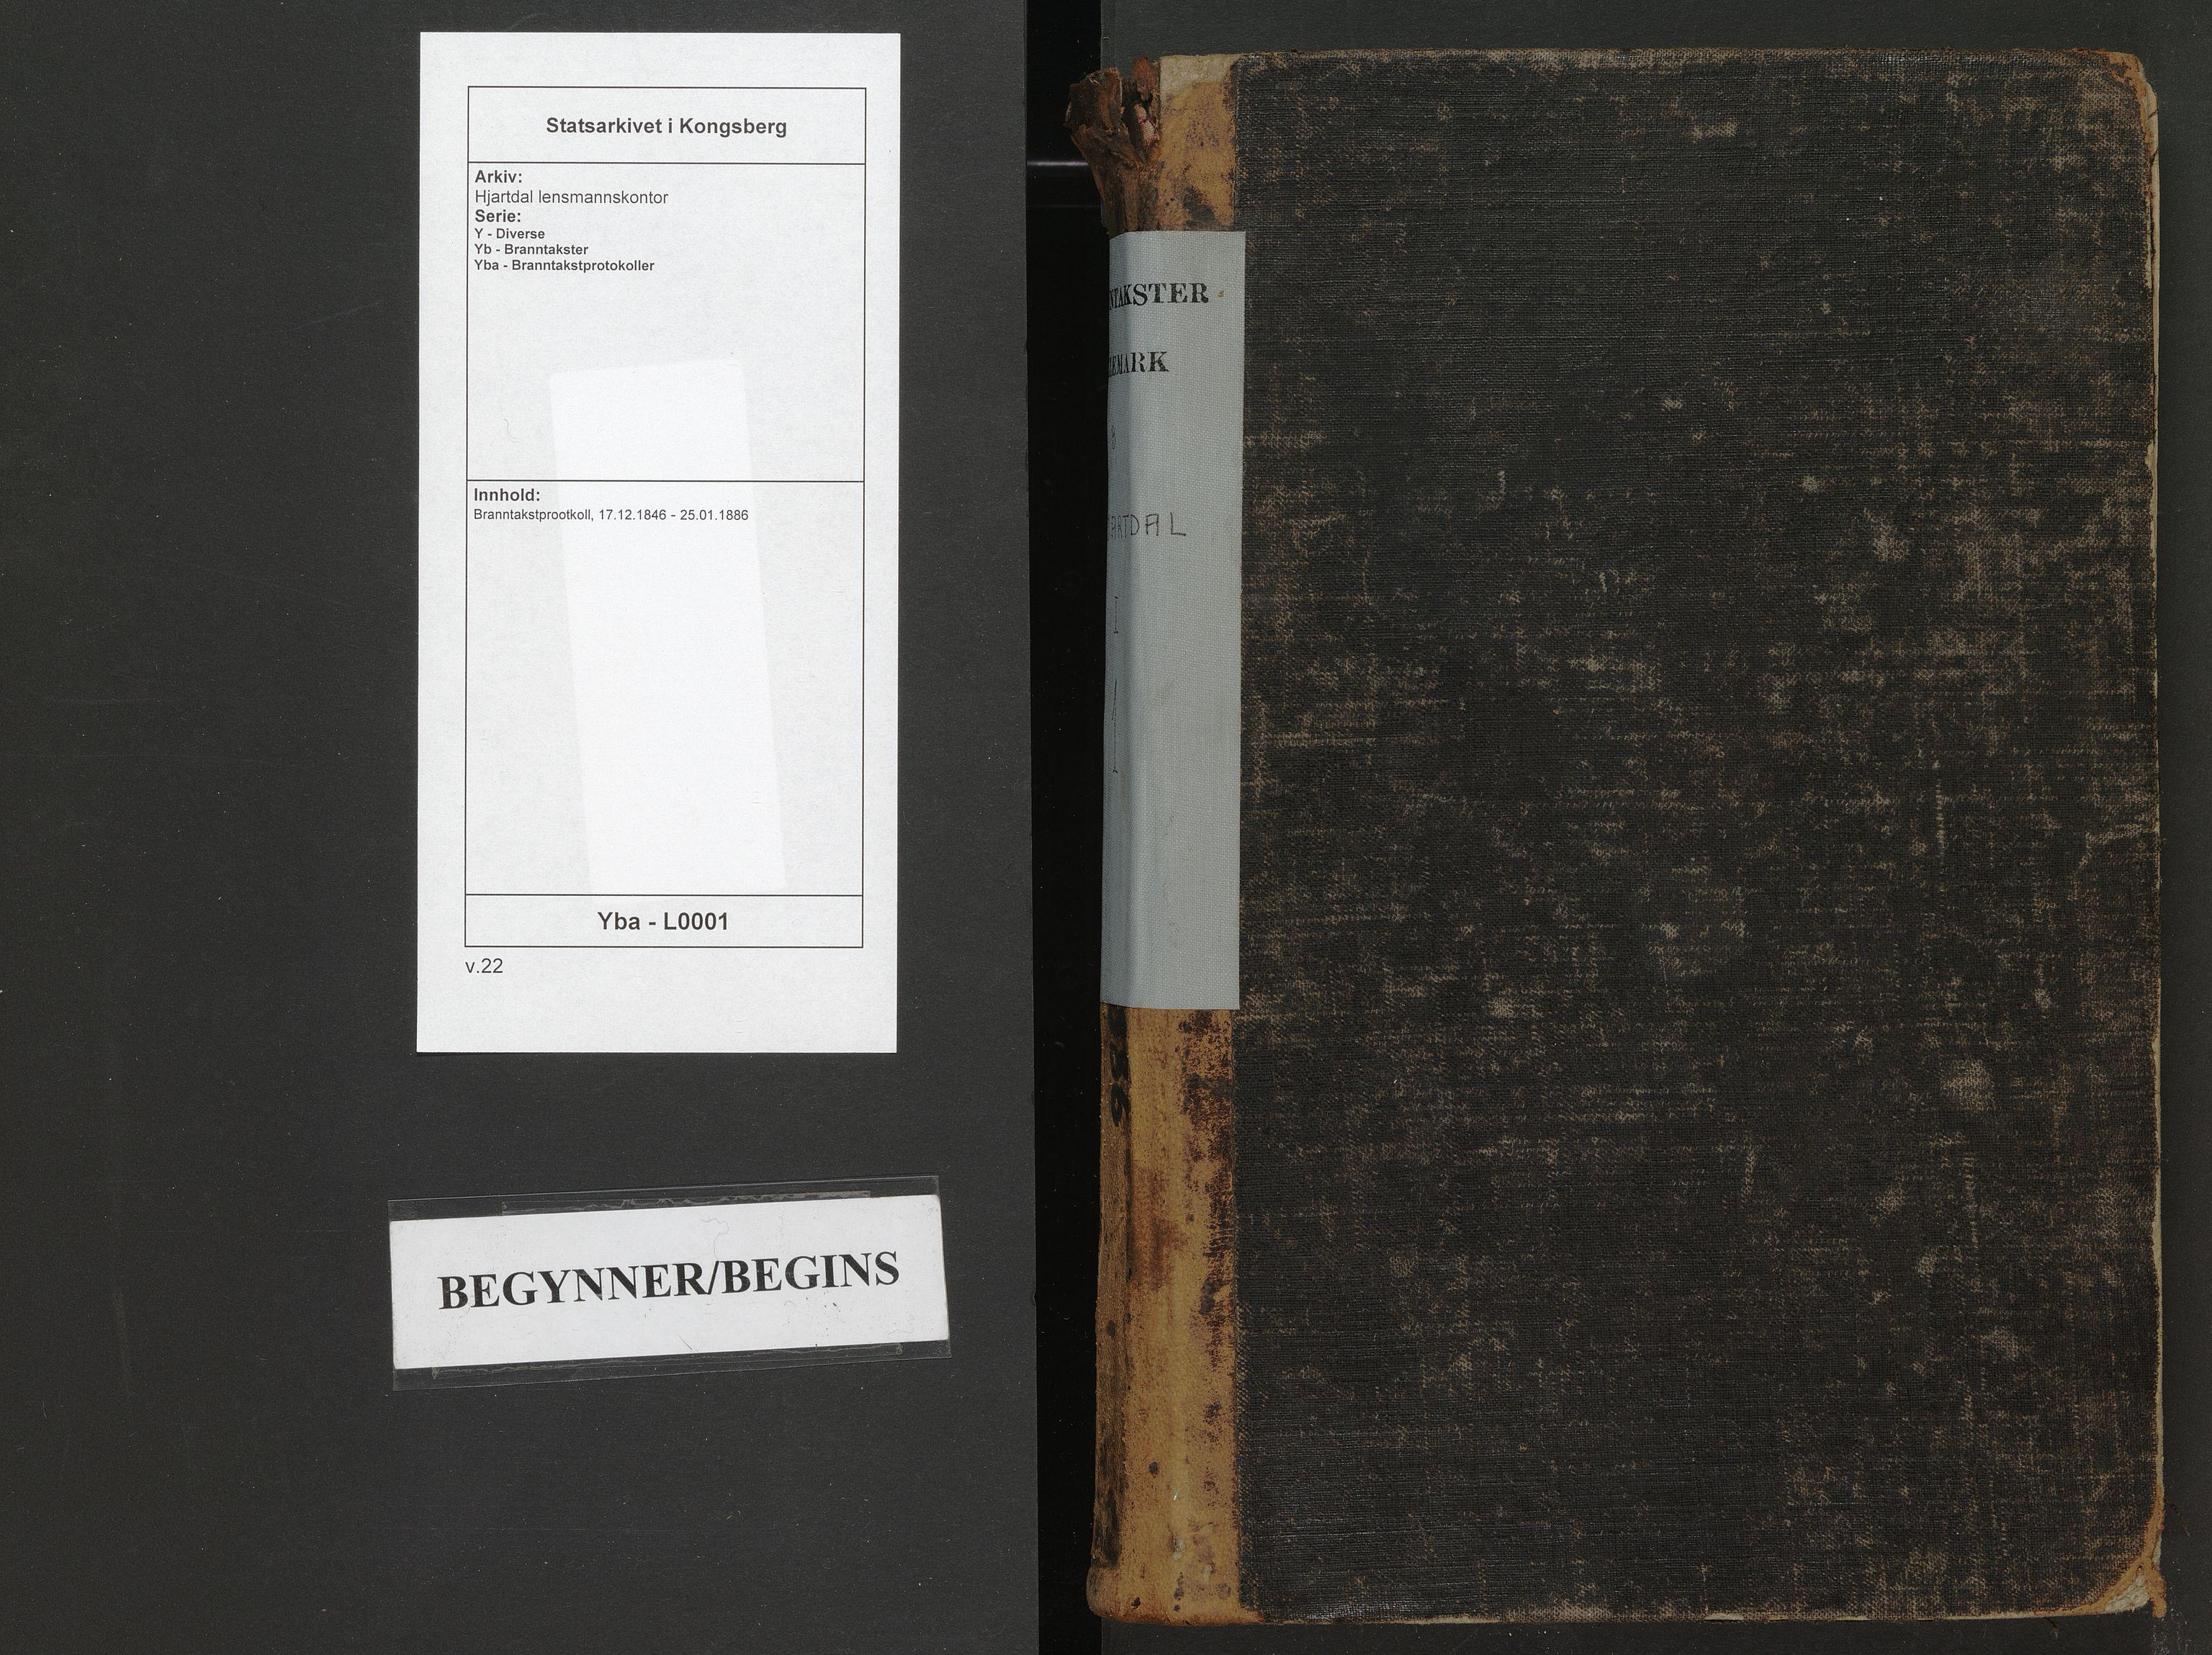 SAKO, Hjartdal lensmannskontor, Y/Yb/Yba/L0001: Branntakstprootkoll, 1846-1886